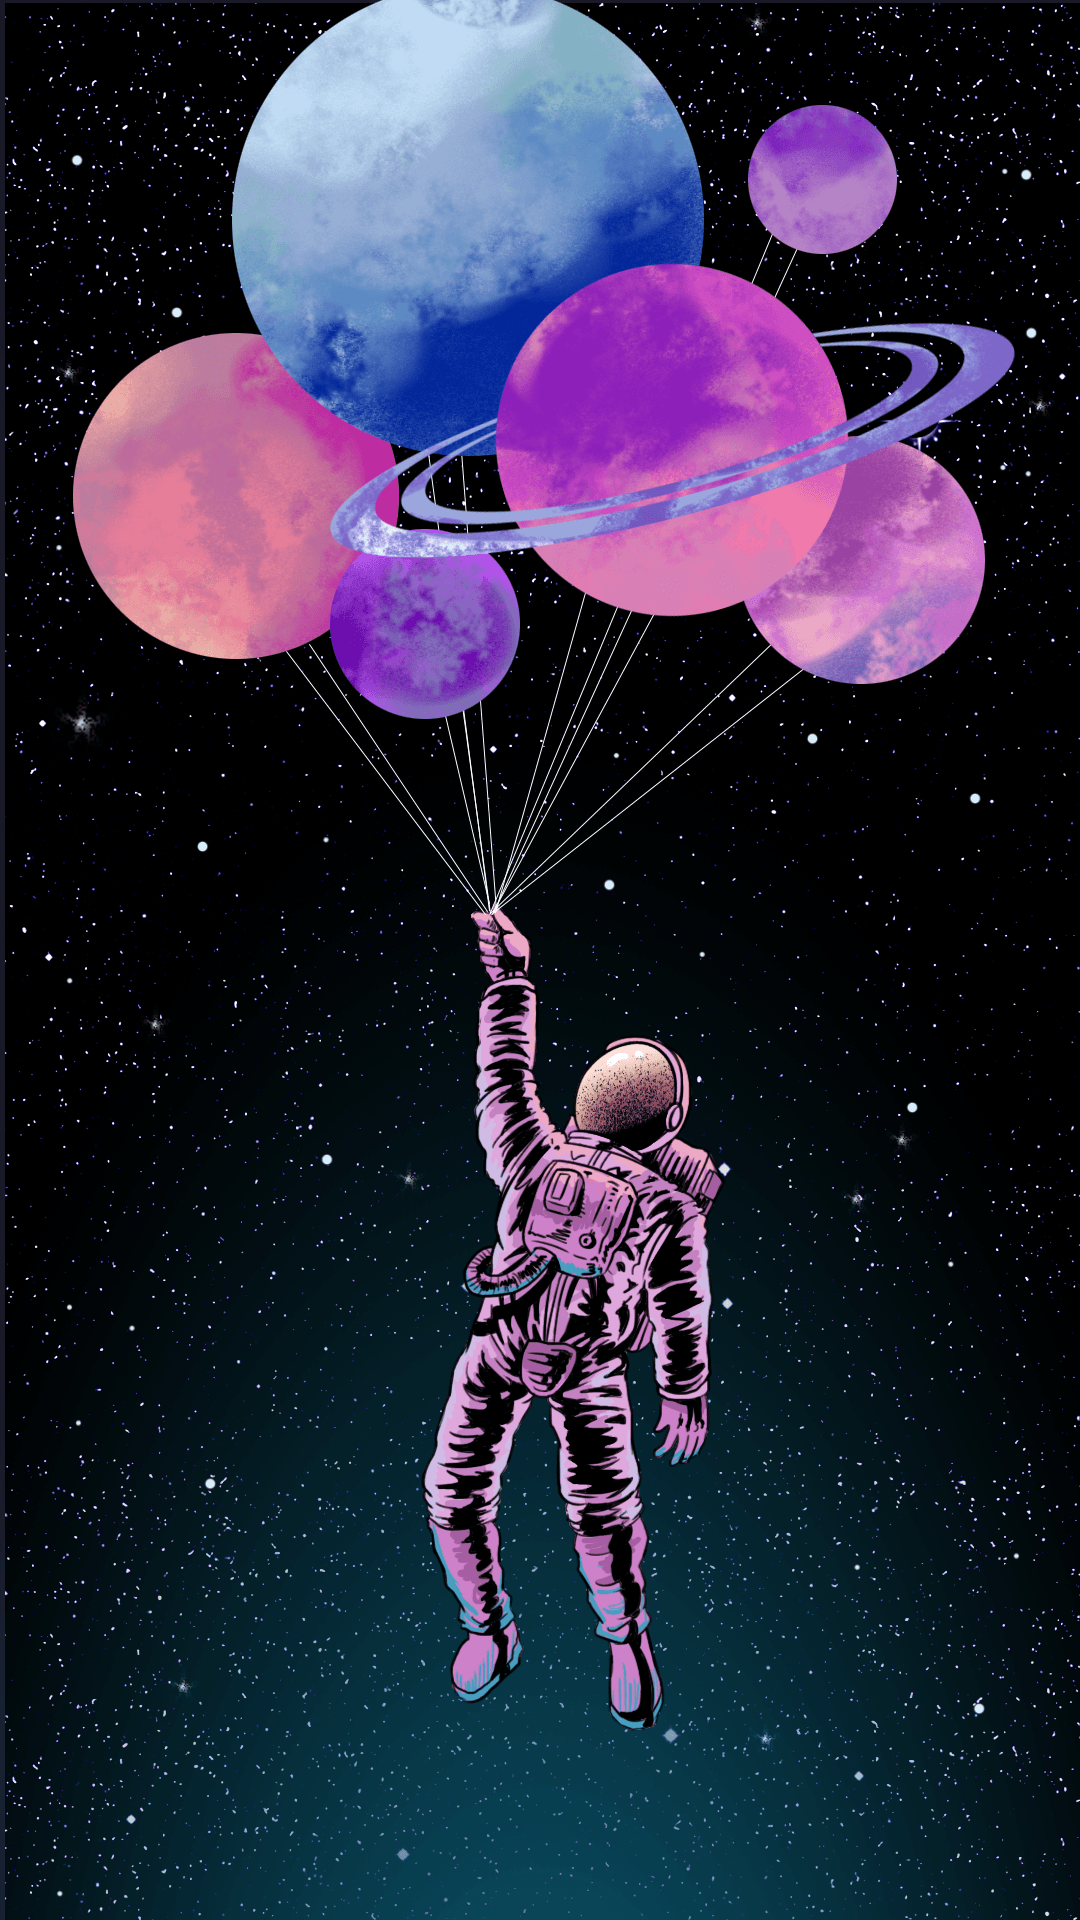 aesthetic astronaut wallpapers